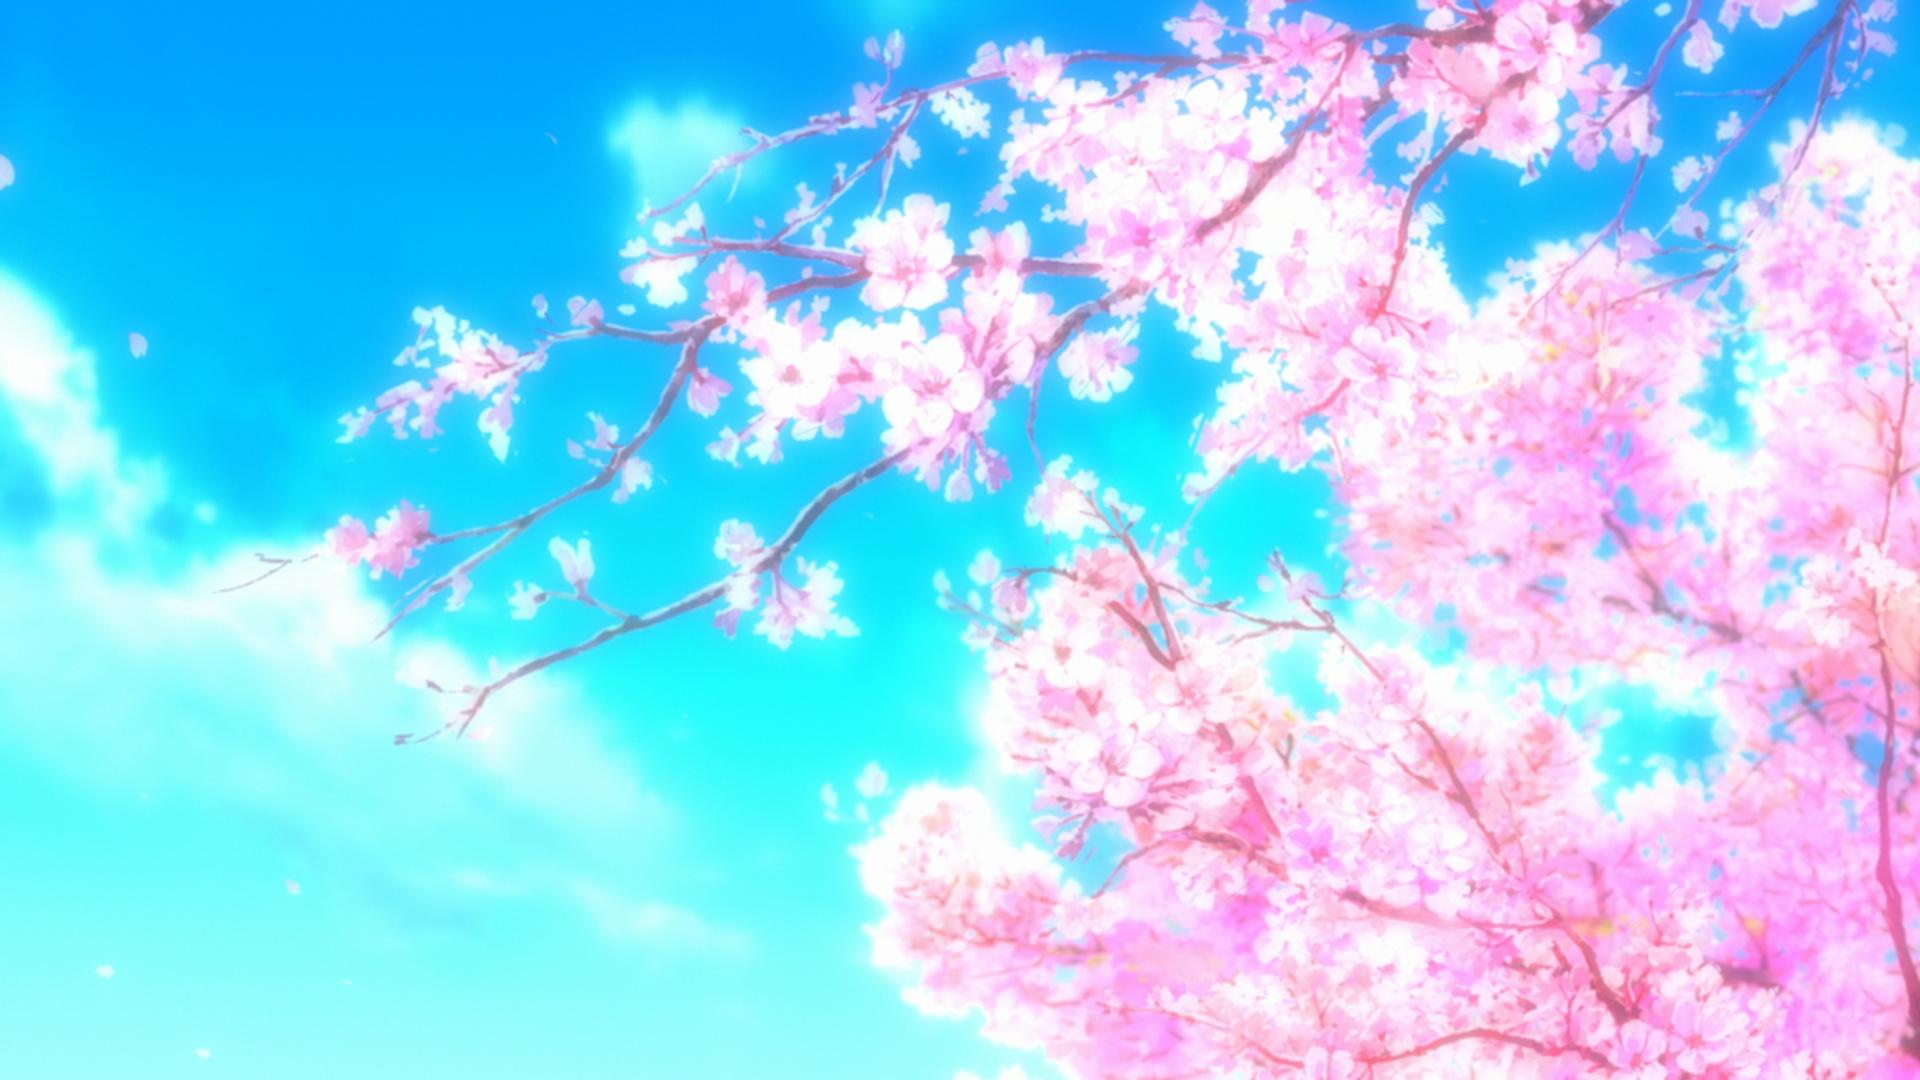 More Discrete Anime Wallpapers Anime Cherry Blossom Cherry Blossom Wallpaper Anime Background